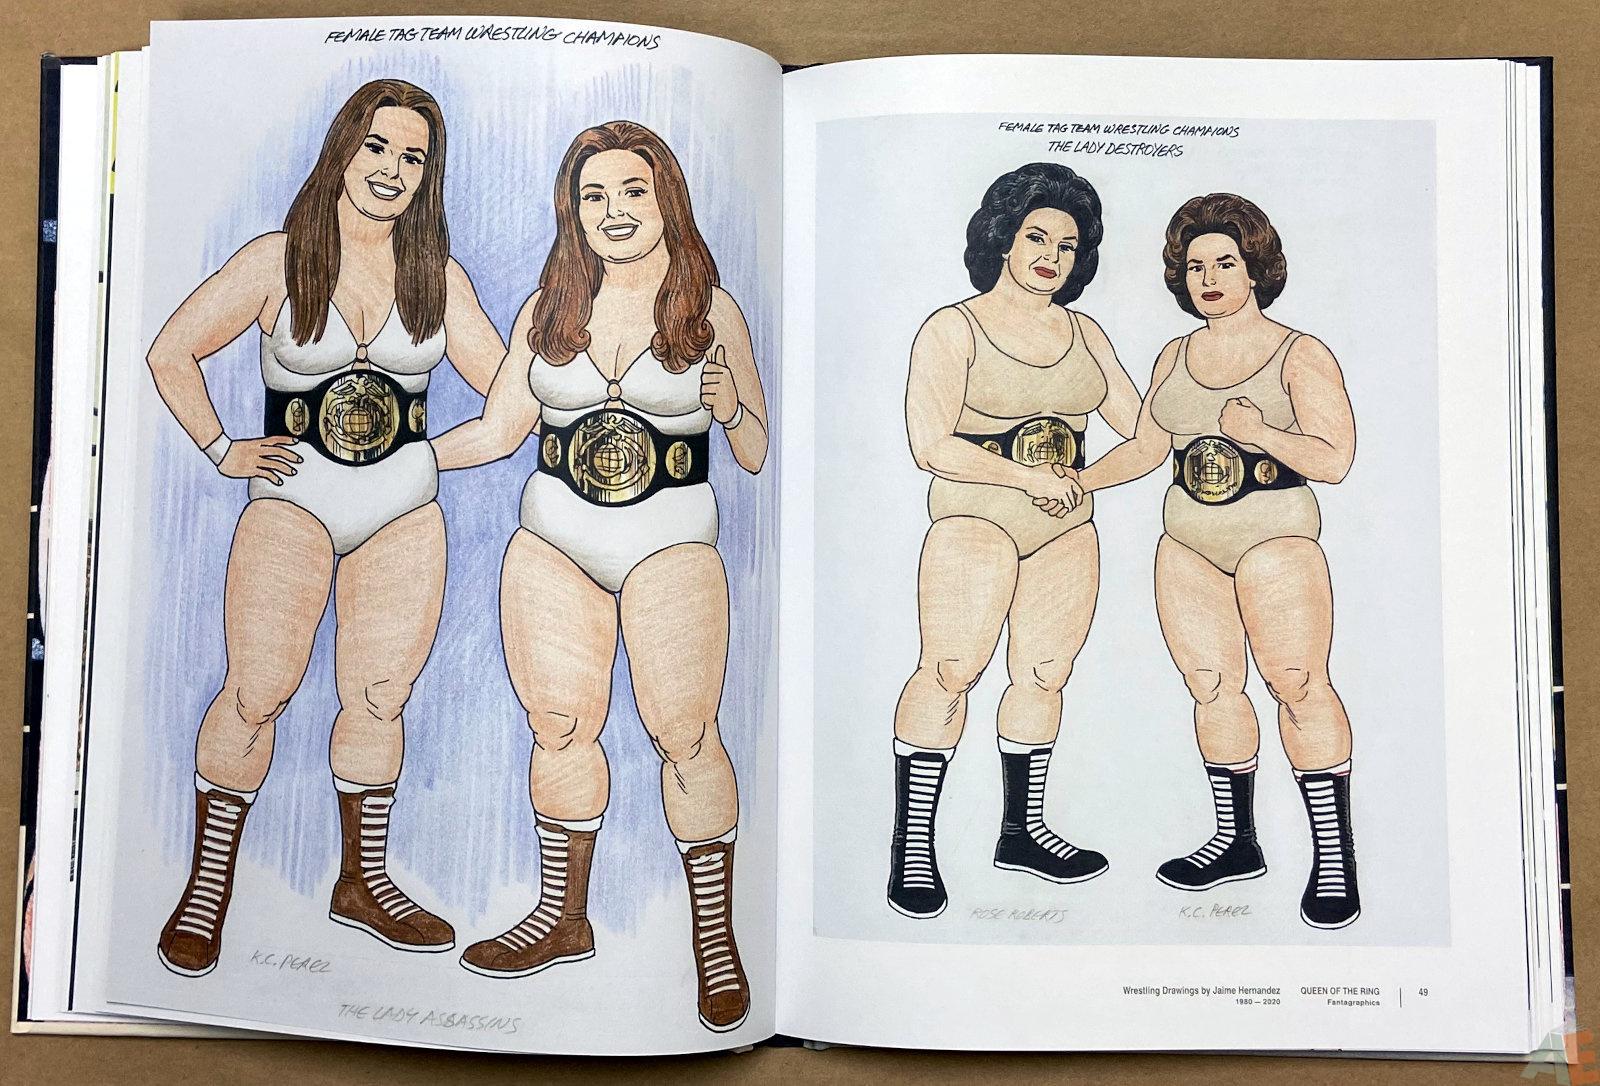 Queen of the Ring Wrestling Drawings by Jaime Hernandez 1980 2020 interior 6